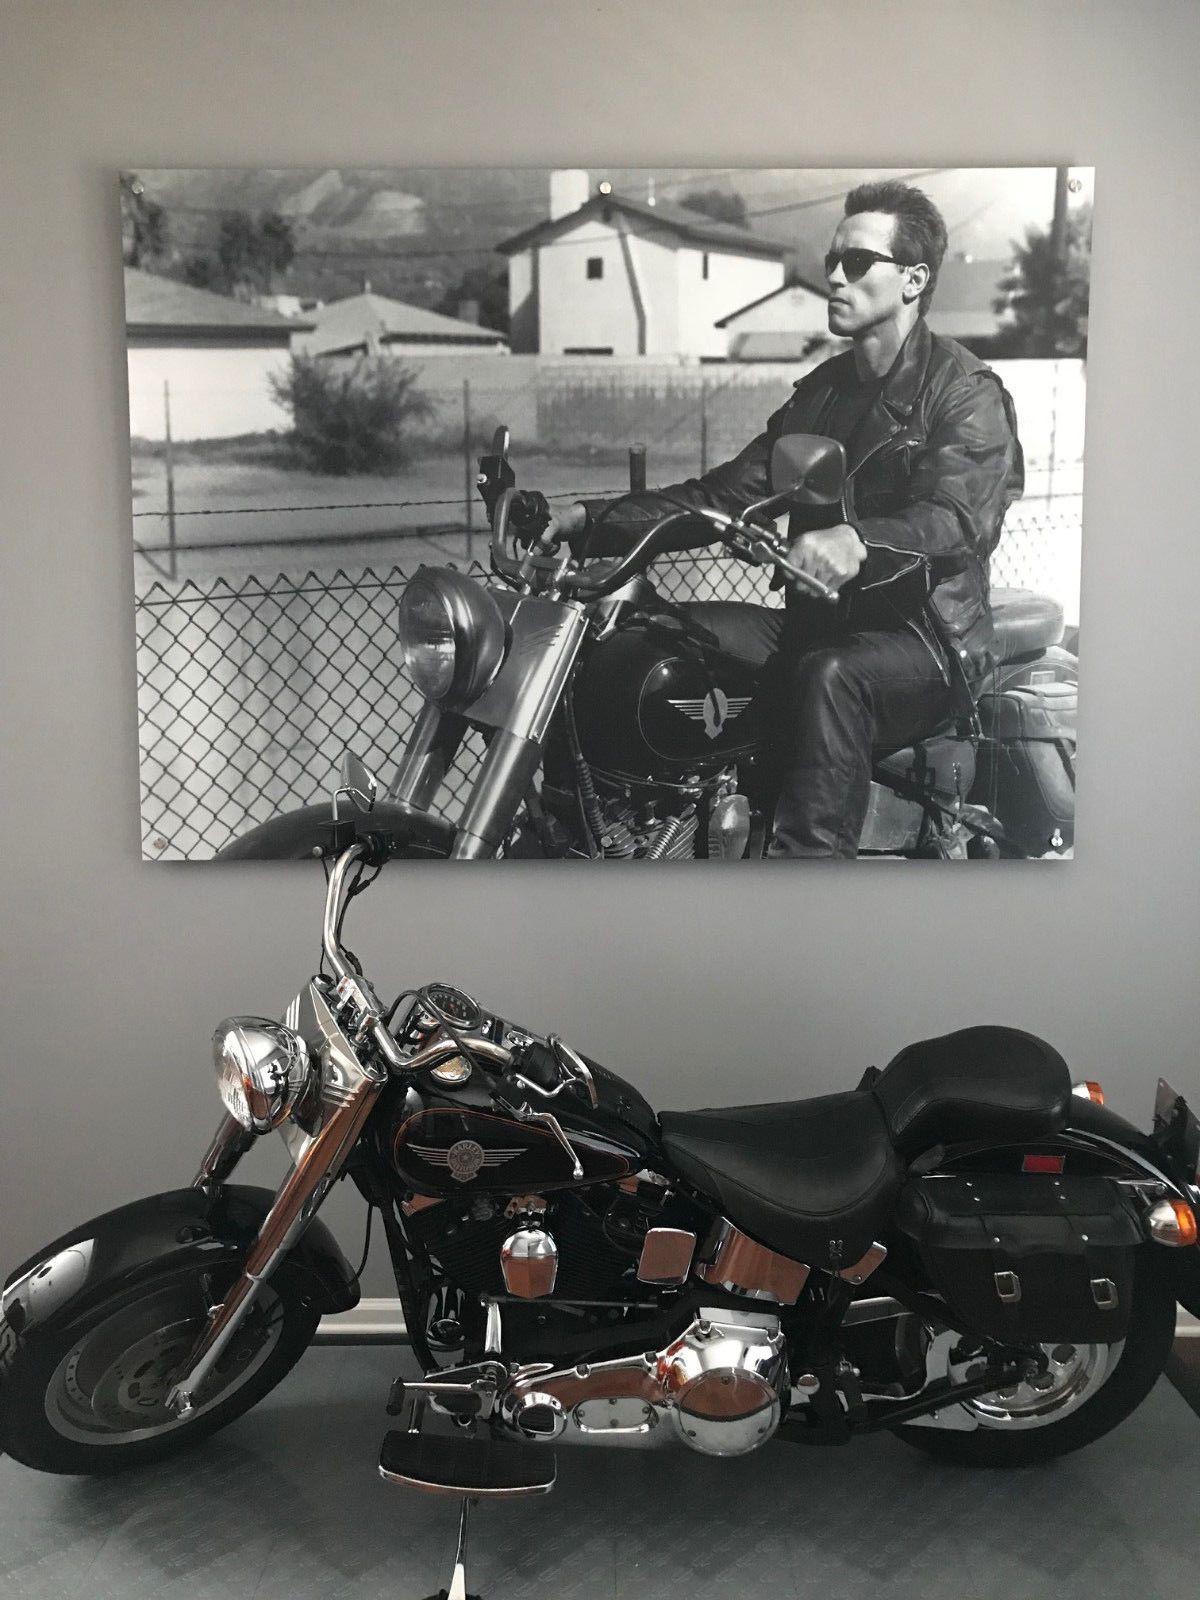 Ebay 1991 Harley Davidson Other Harley Davidson Fatboy 1991 Terminator Bike Harleydavidson Harley Fatboy Harley Harley Davidson